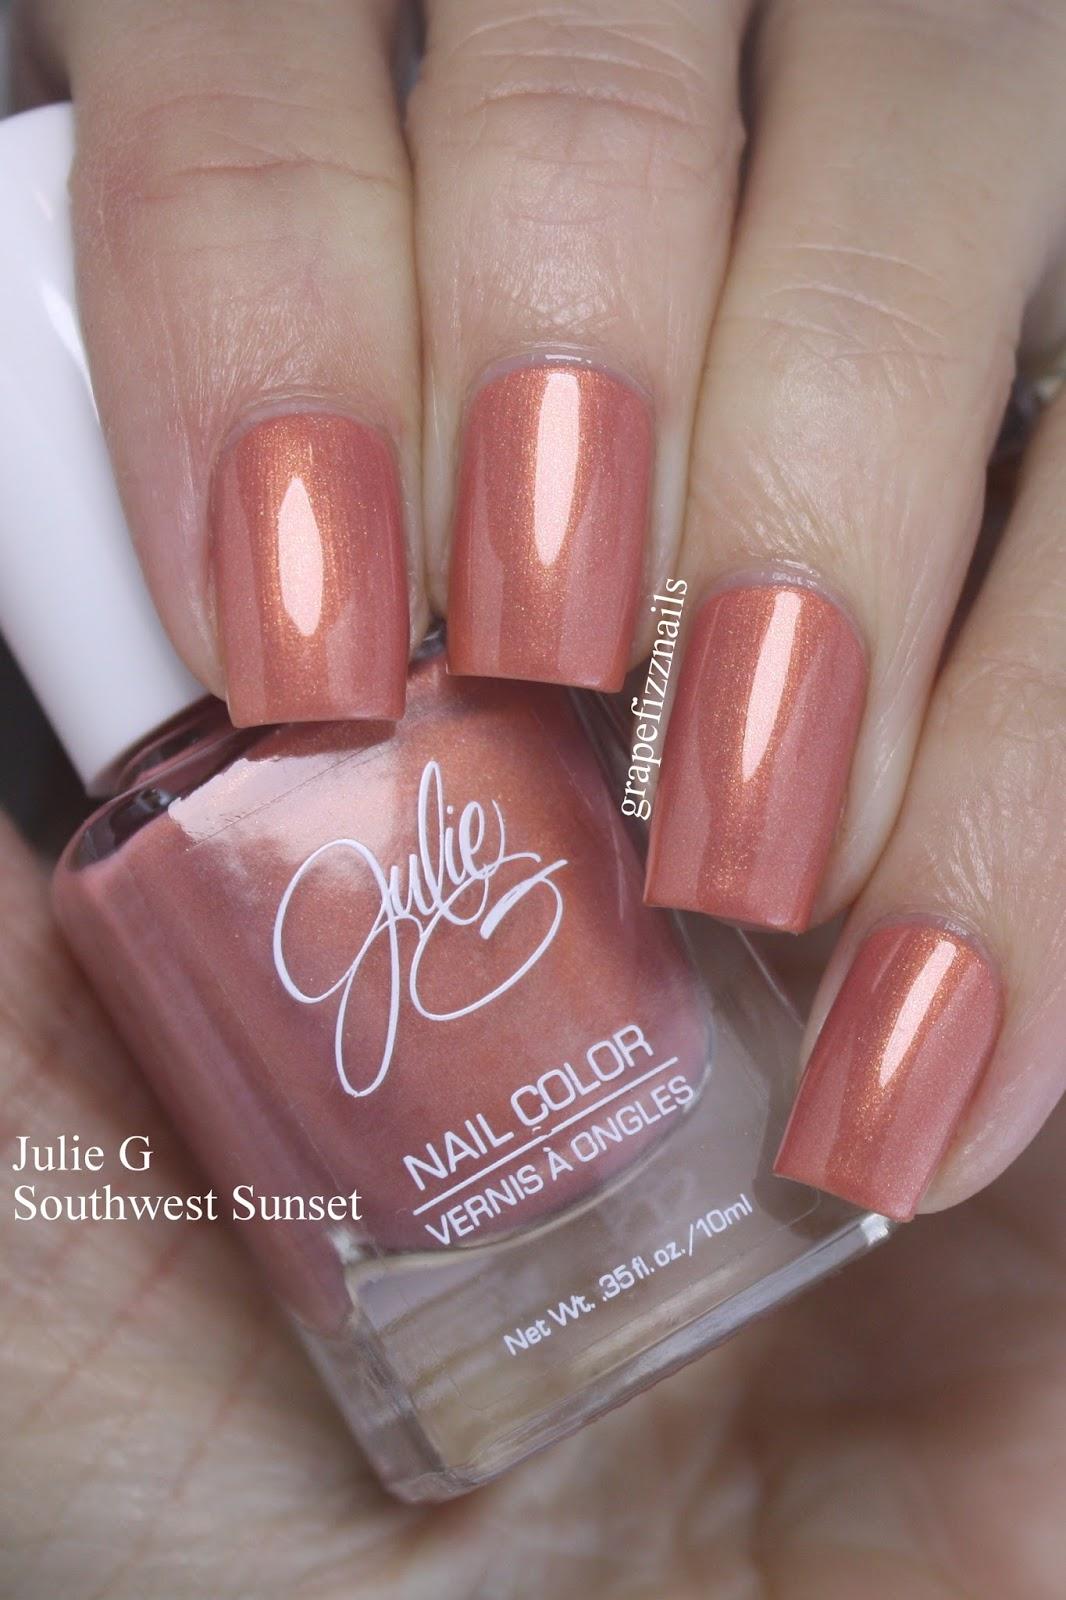 Grape Fizz Nails: Julie G Southwest Sunset